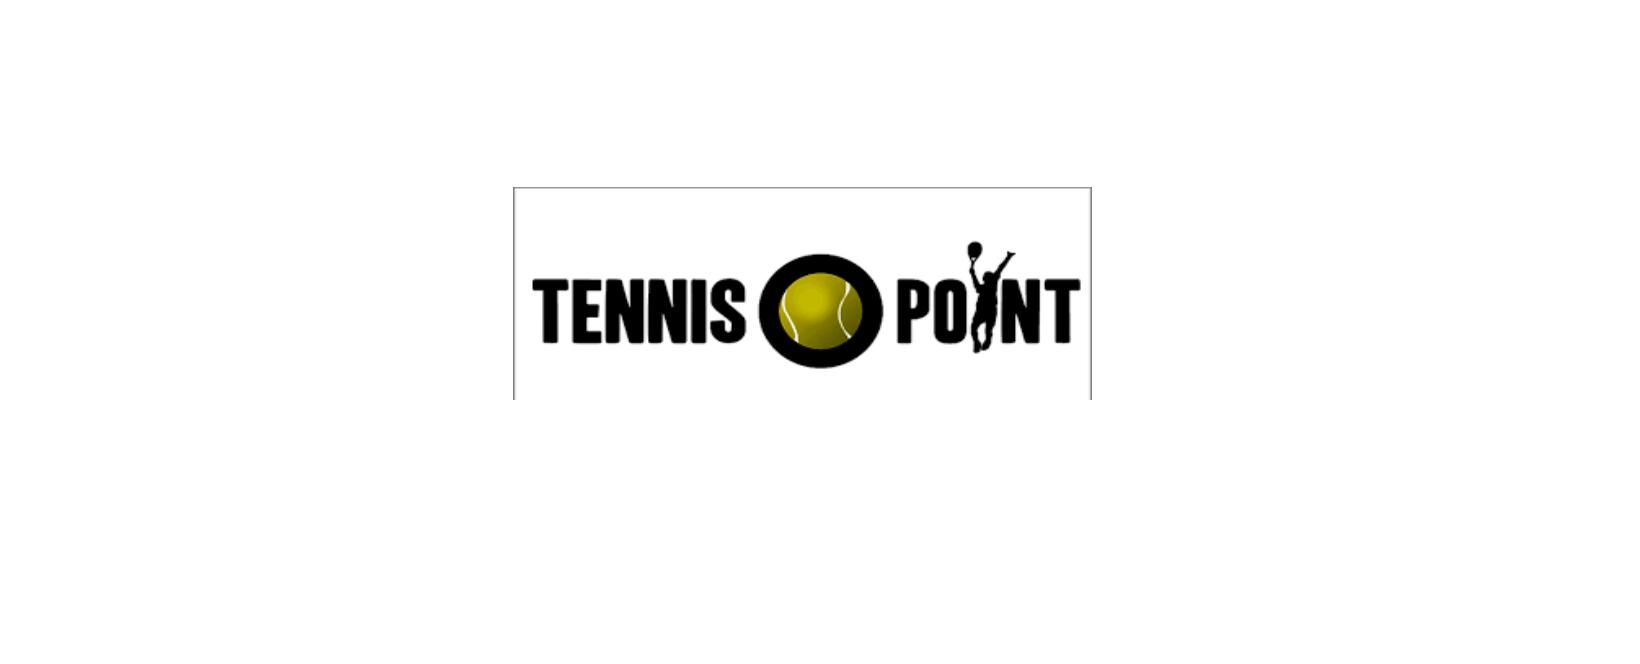 Tennis Point Discount Code 2021